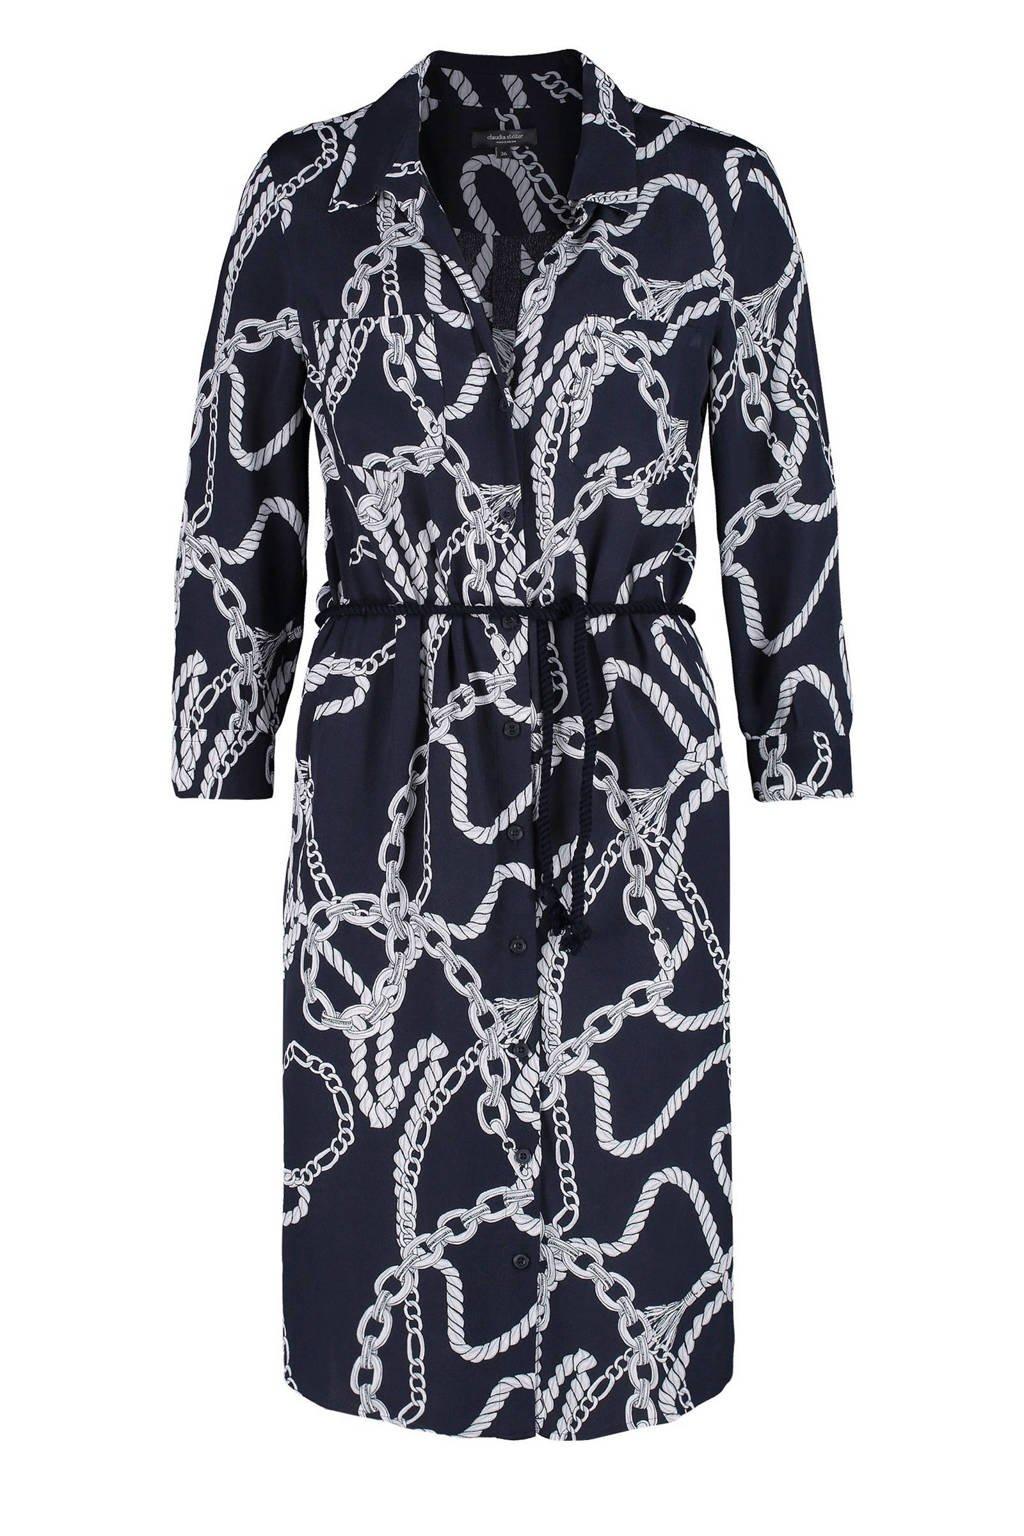 Claudia Sträter blousejurk met all over print en ceintuur marineblauw/wit, Marineblauw/wit